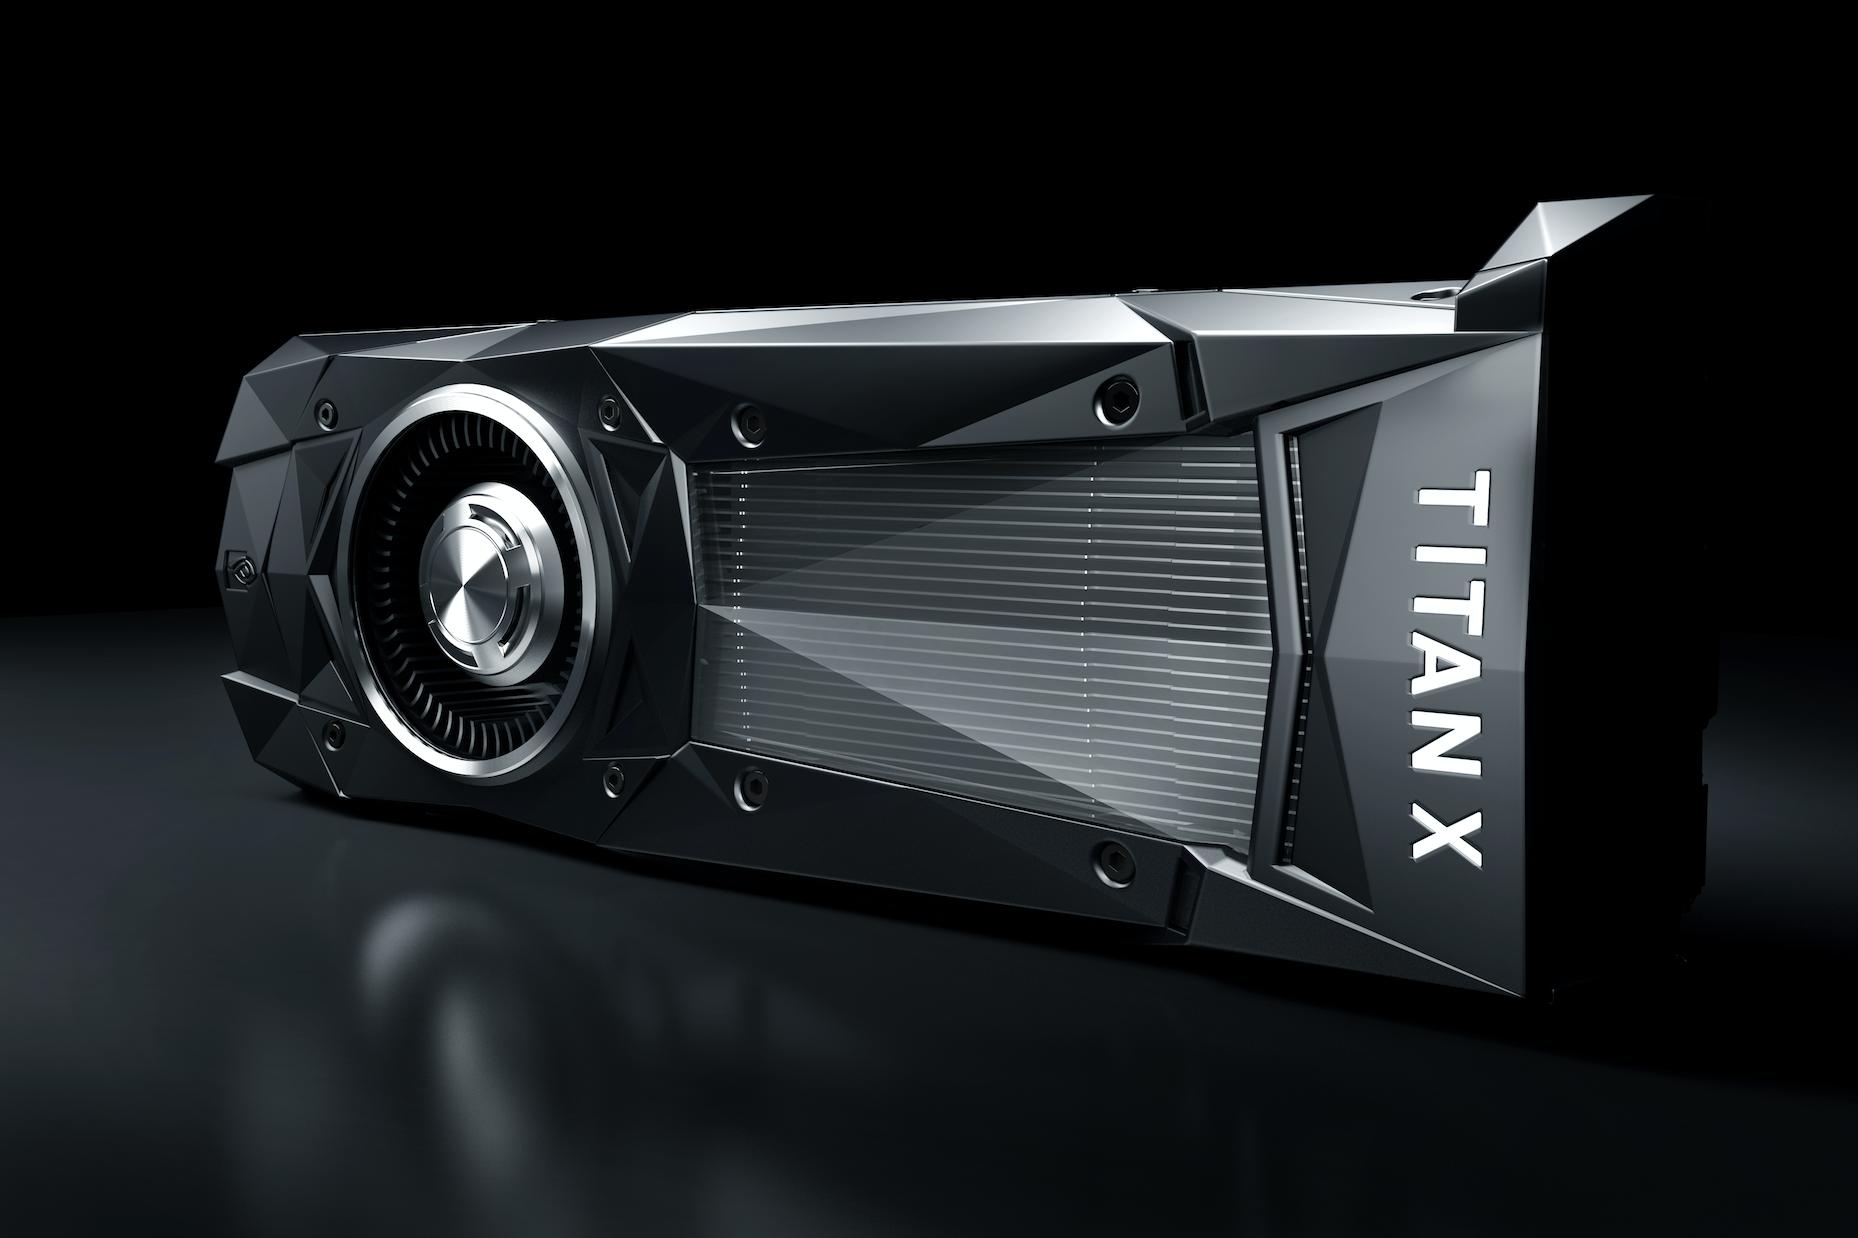 NVIDIA's Titan X GPU